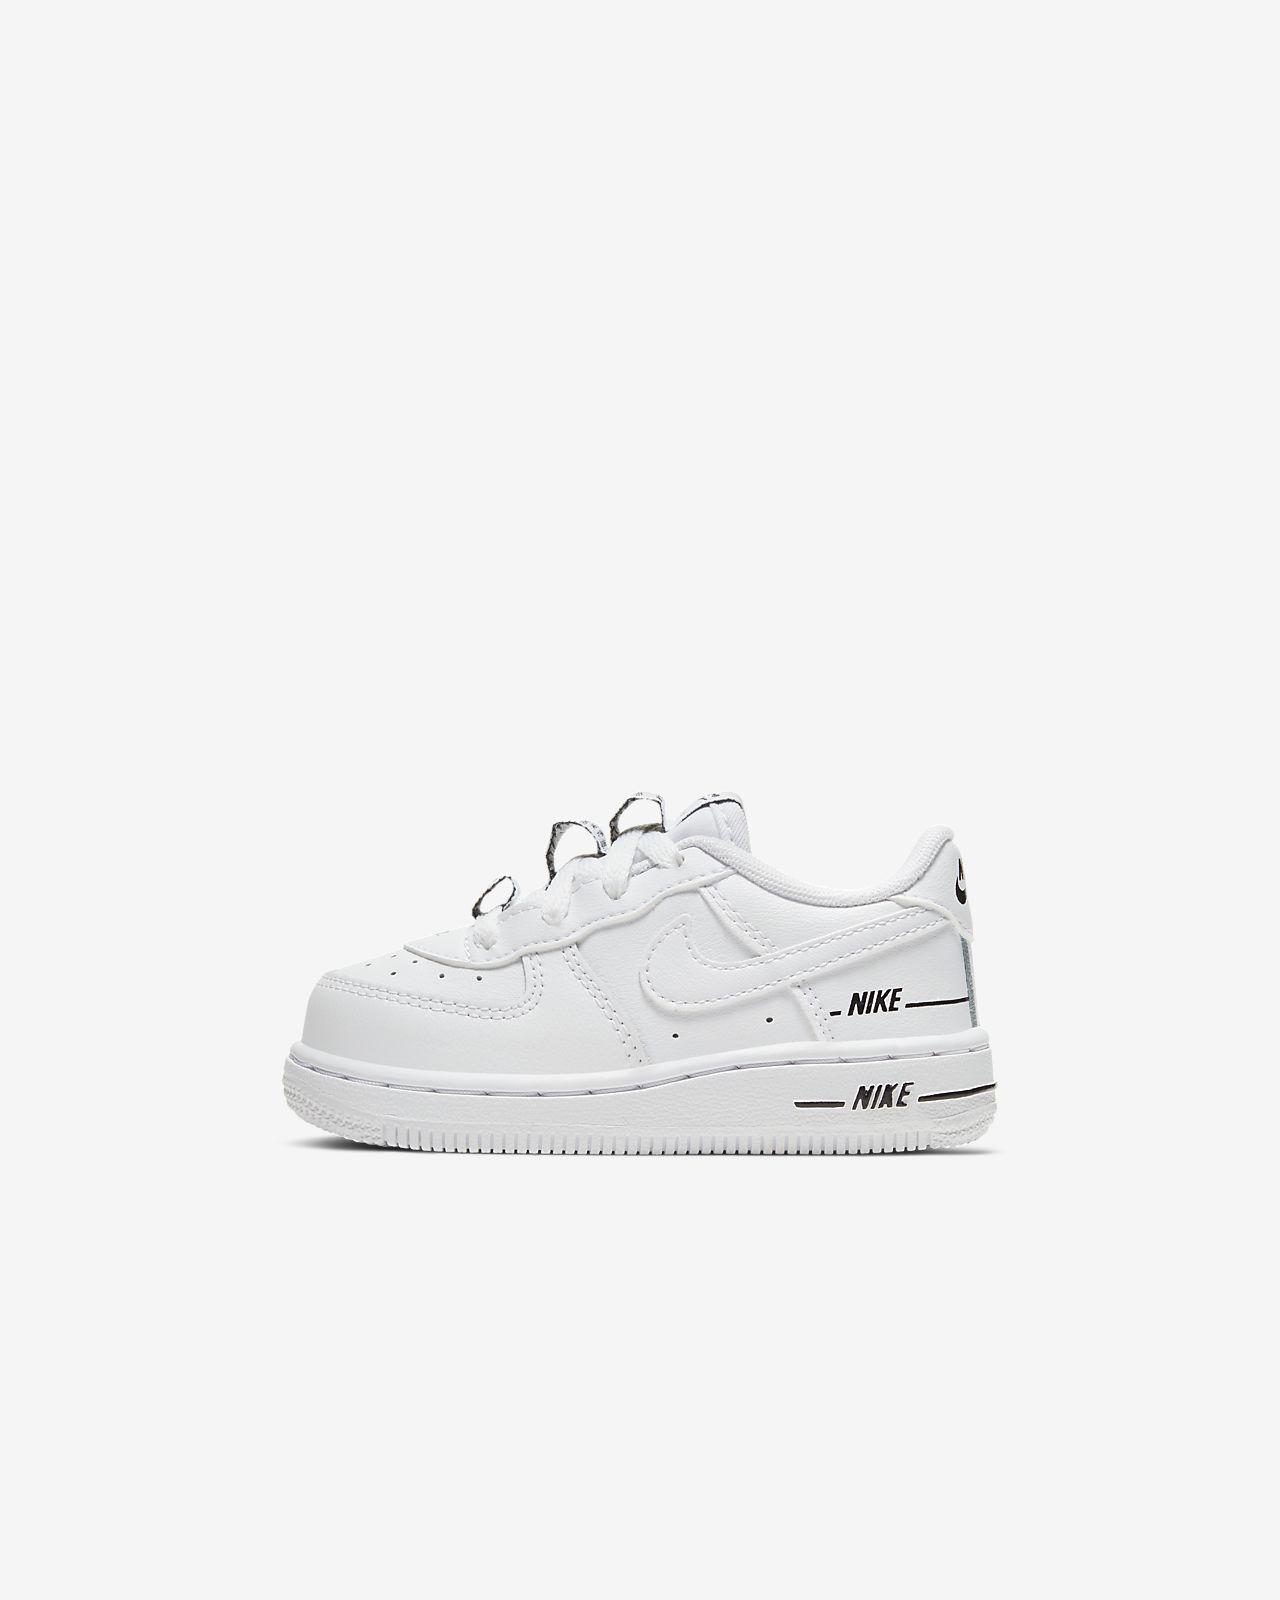 Nike Force 1 LV8 3 sko til babyersmåbørn